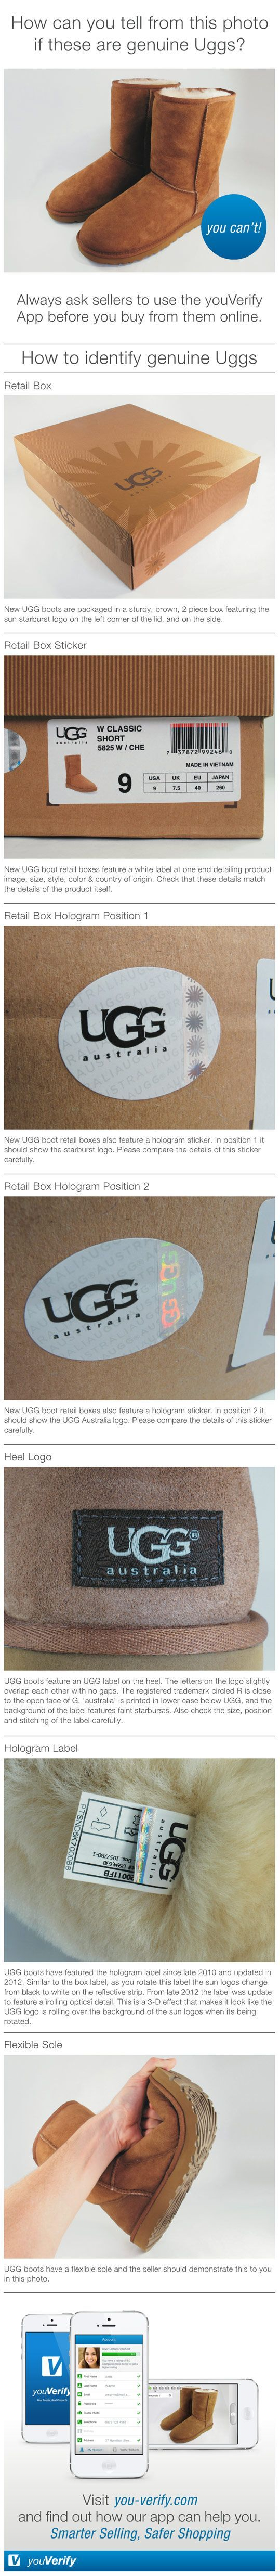 ugg authenticity label sun logo